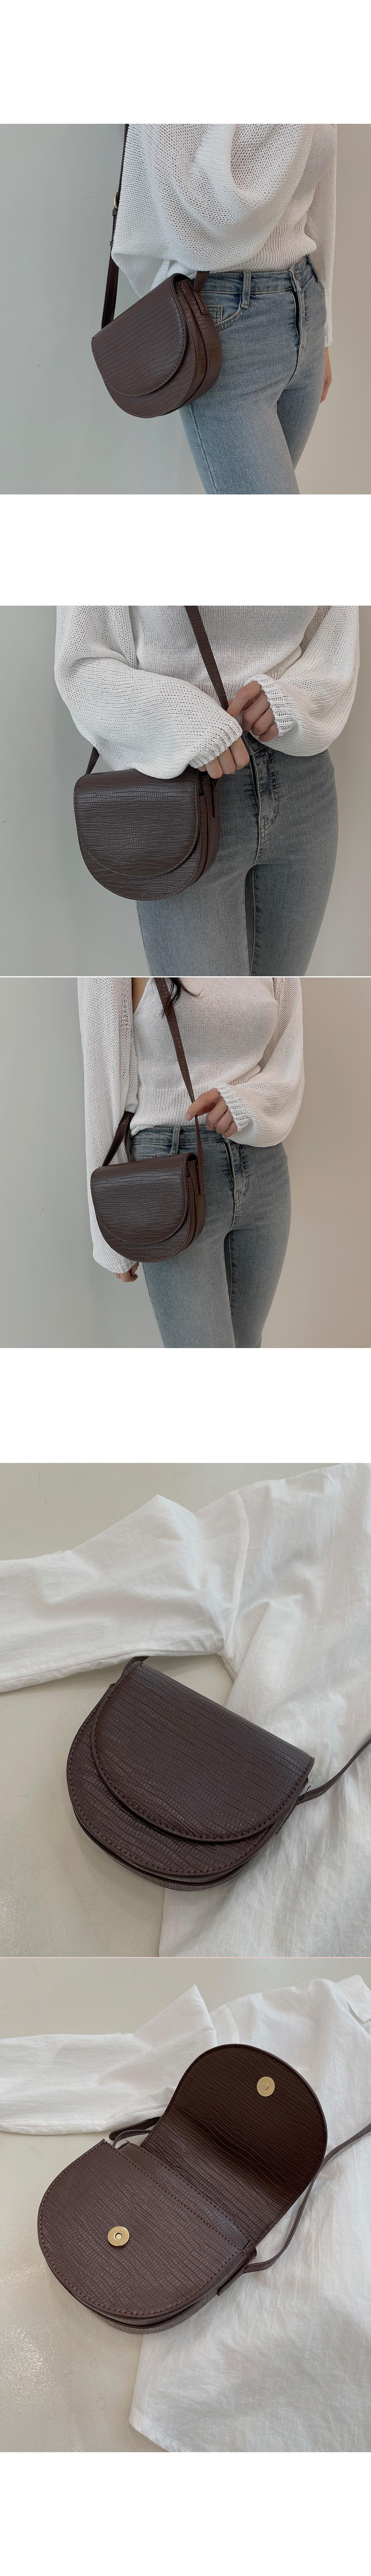 mini half moon crossbody bag